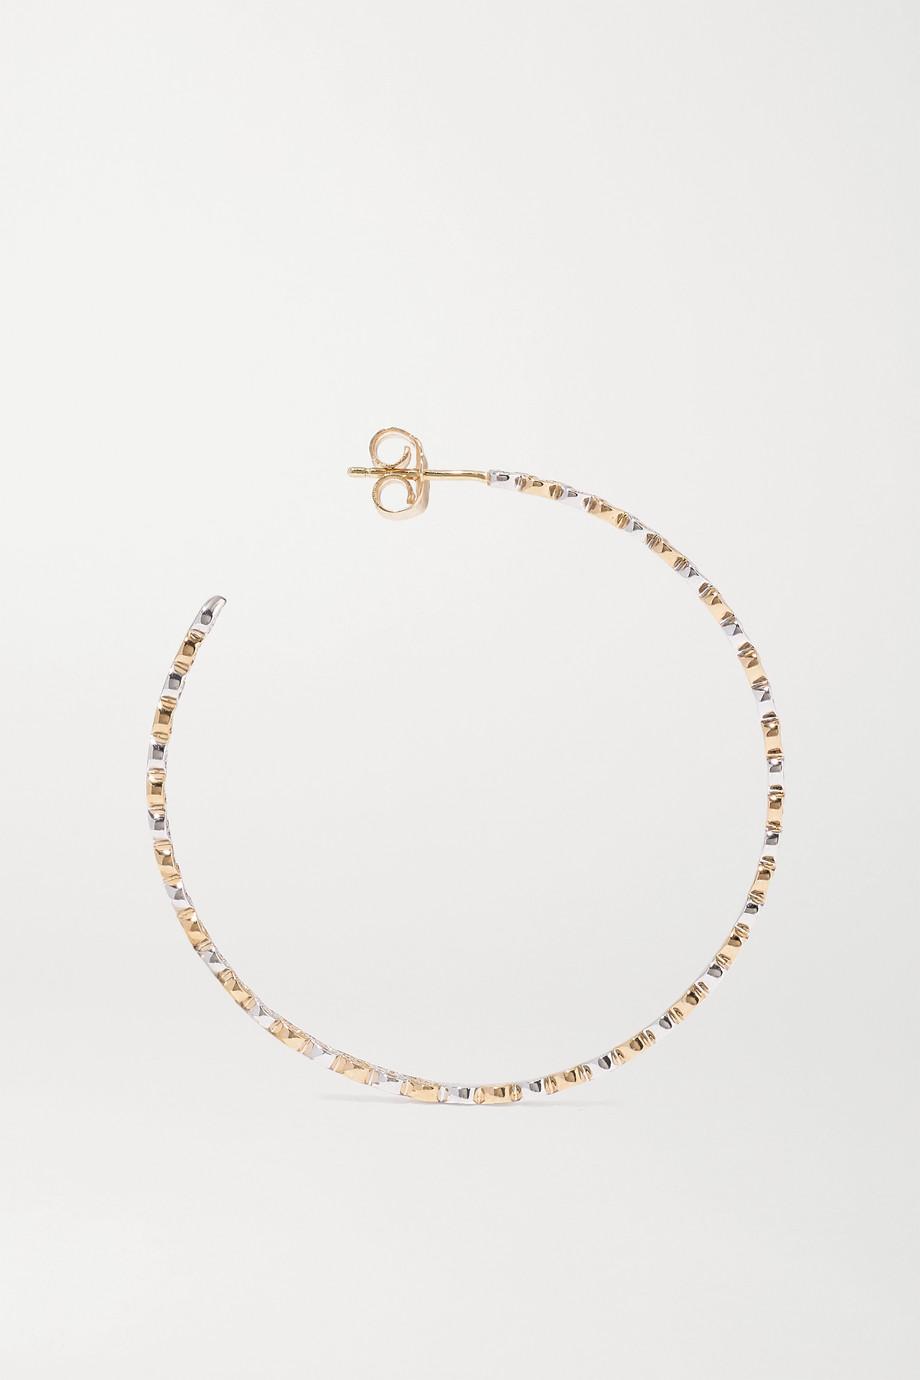 Sydney Evan Large Eternity Heart 14-karat yellow and white gold diamond hoop earrings